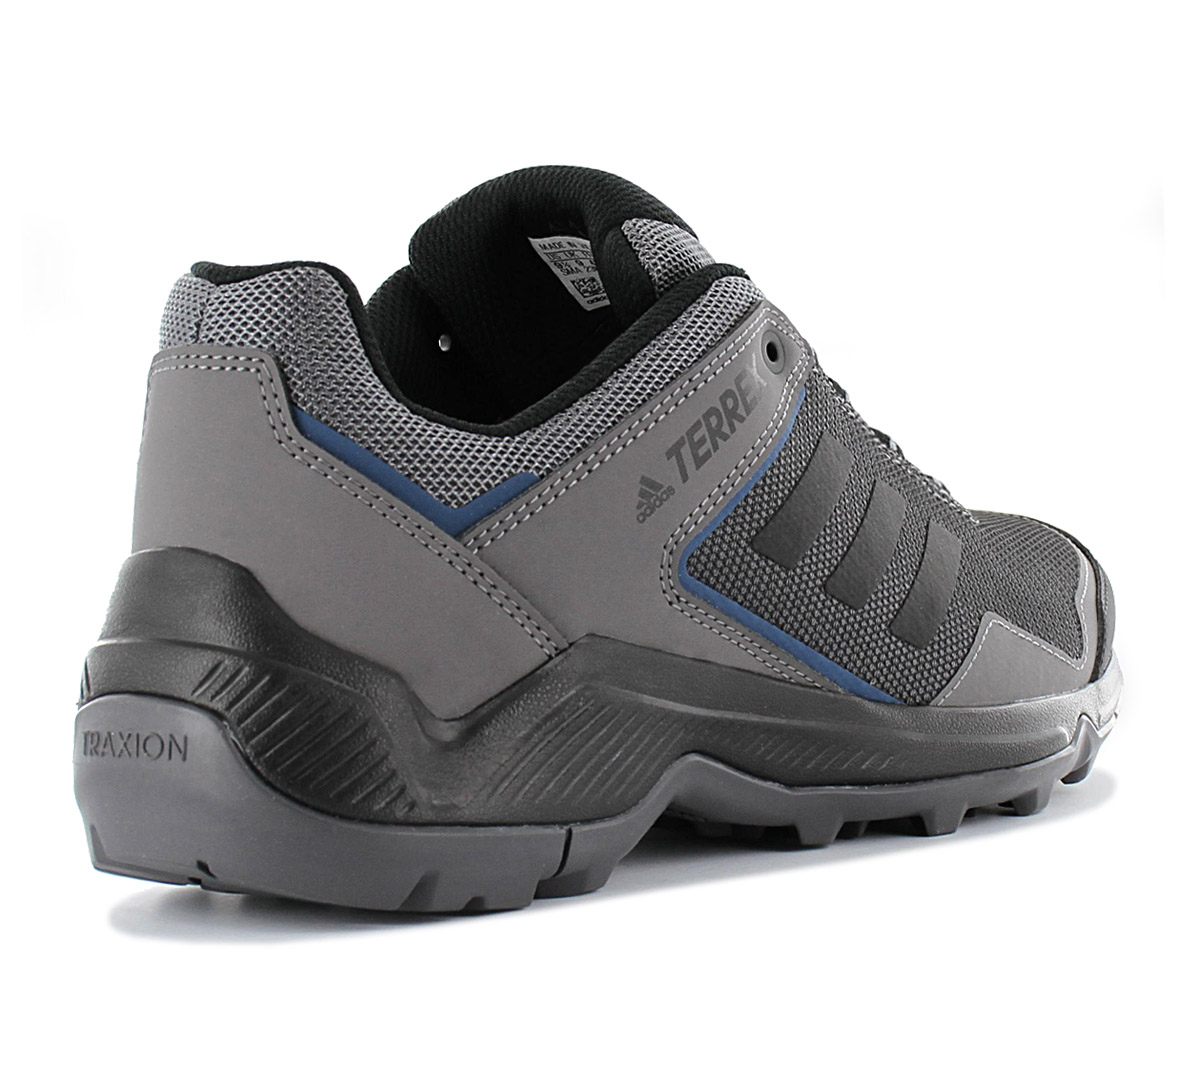 adidas Terrex Eastrail Herren Wanderschuhe BC0972 Outdoor Trail Schuh Sportschuh